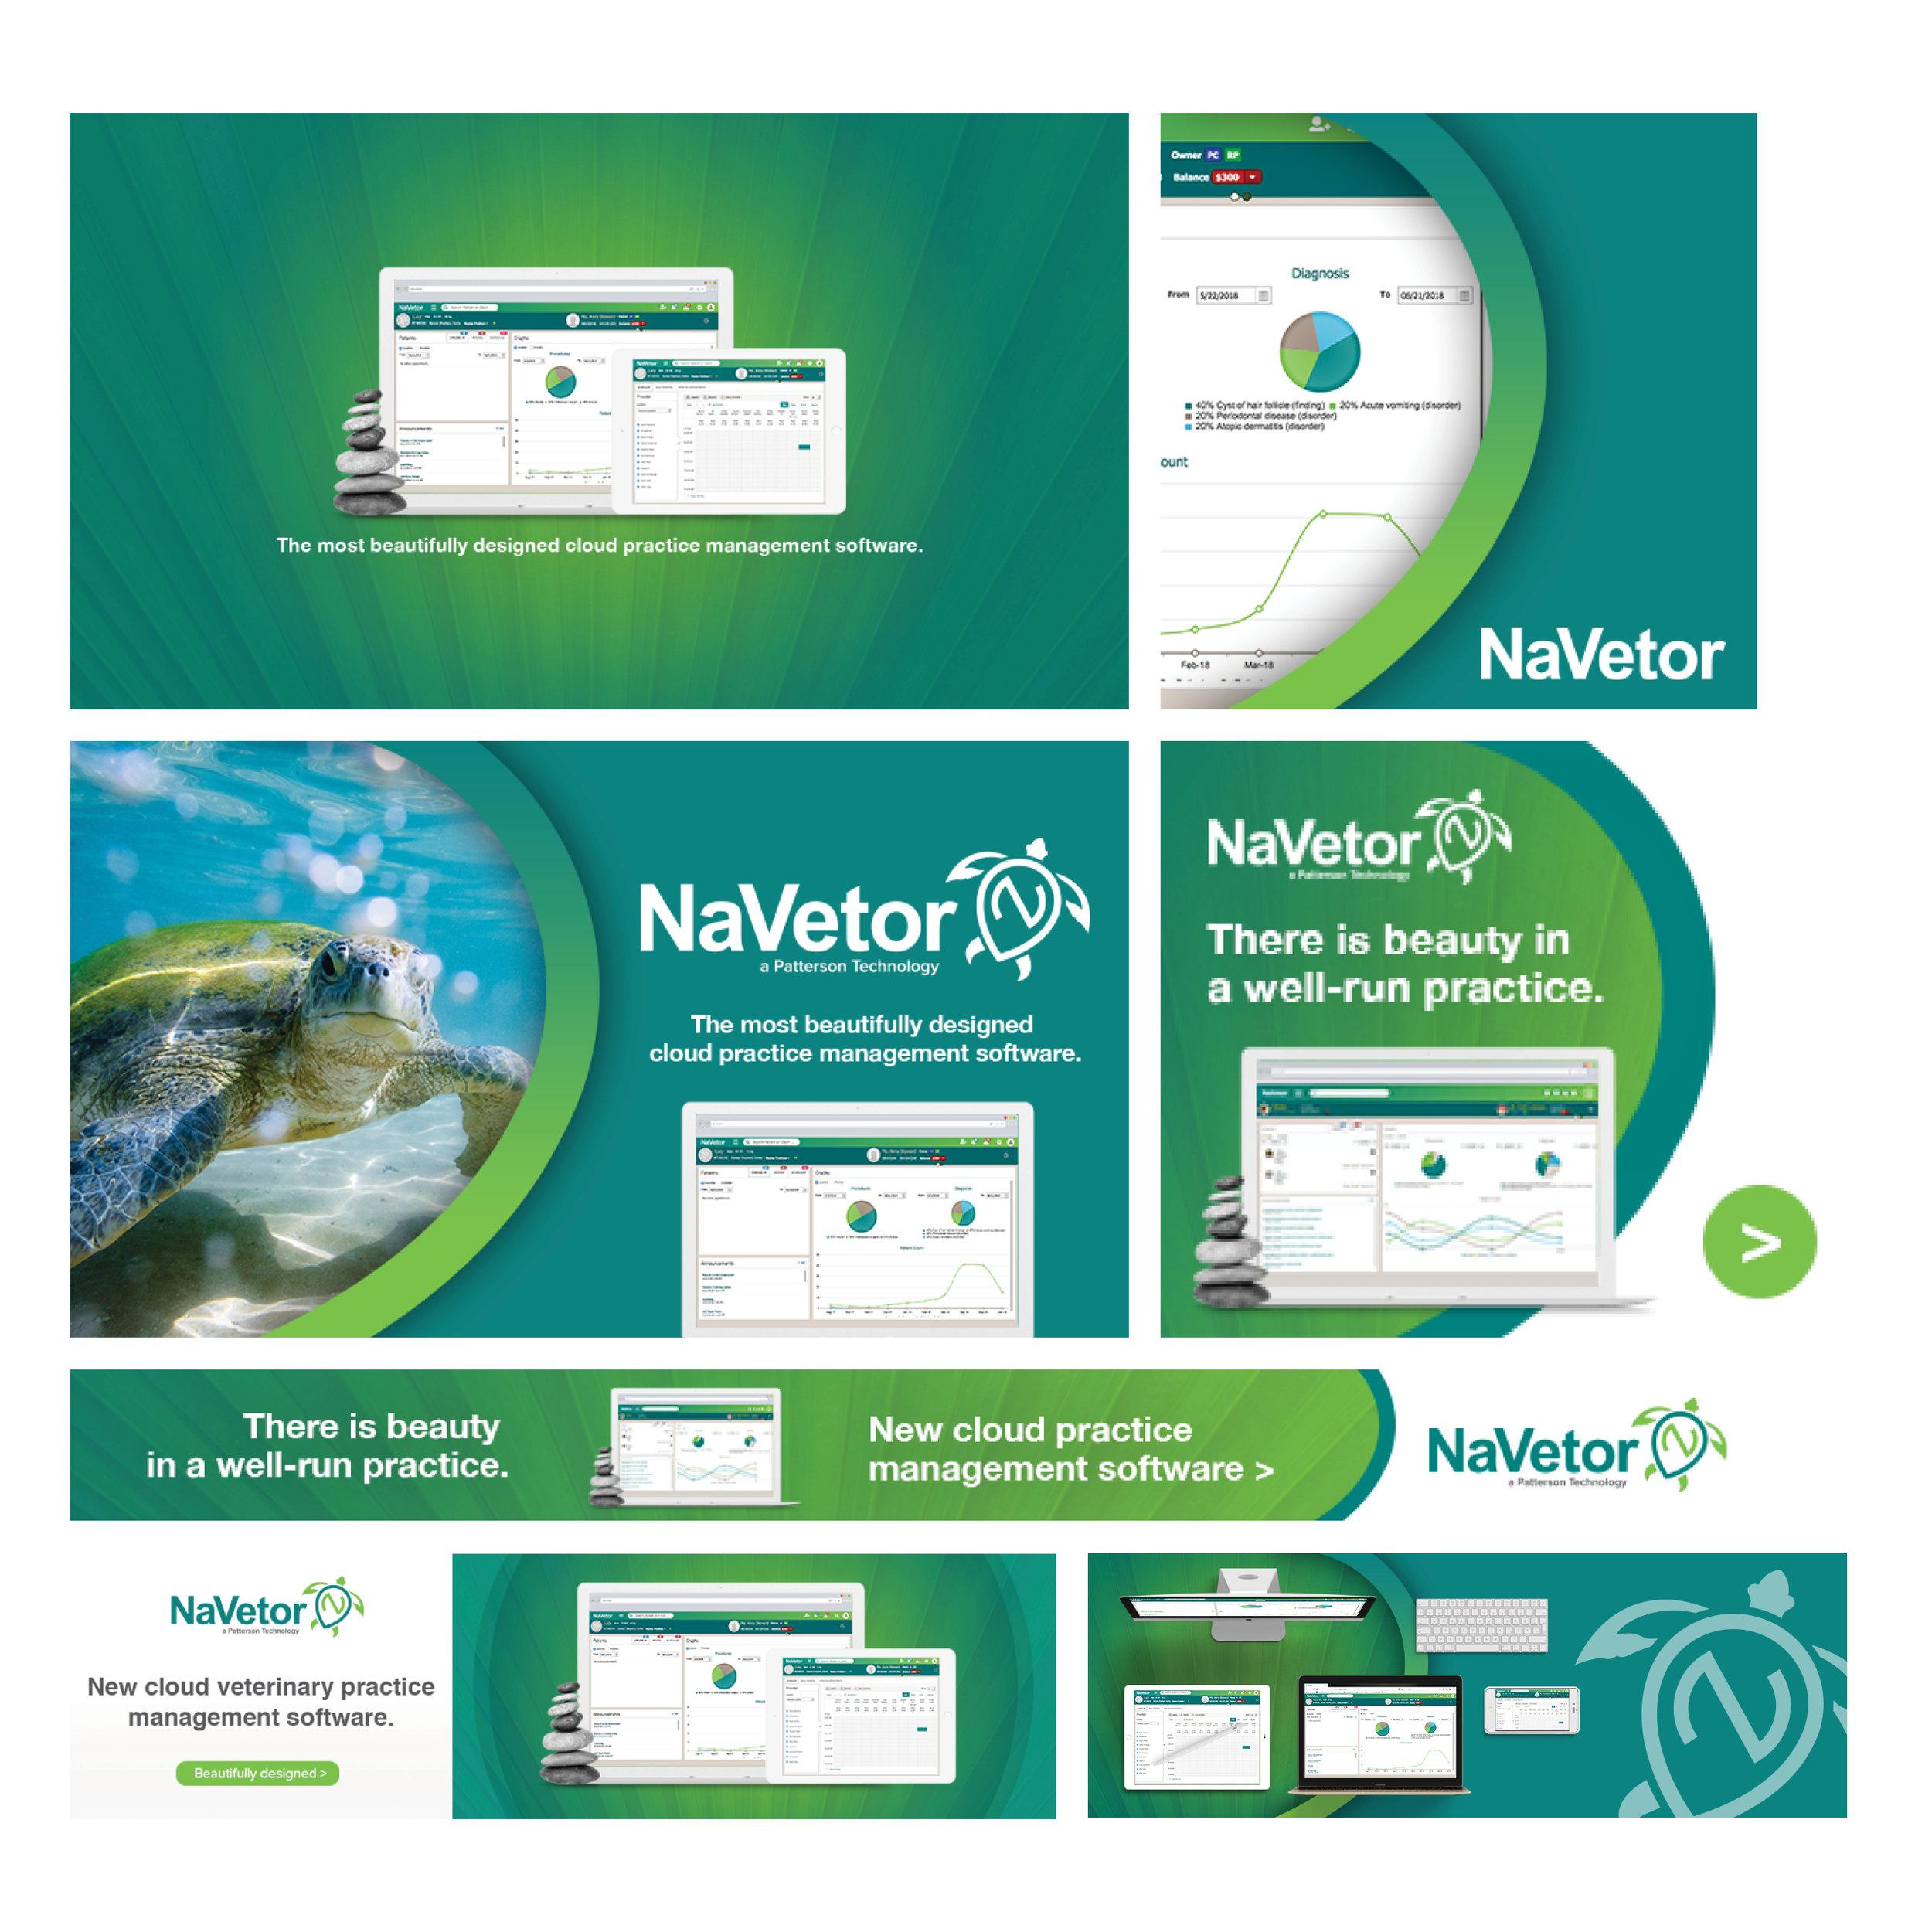 NaVetor Digital Marketing Ads